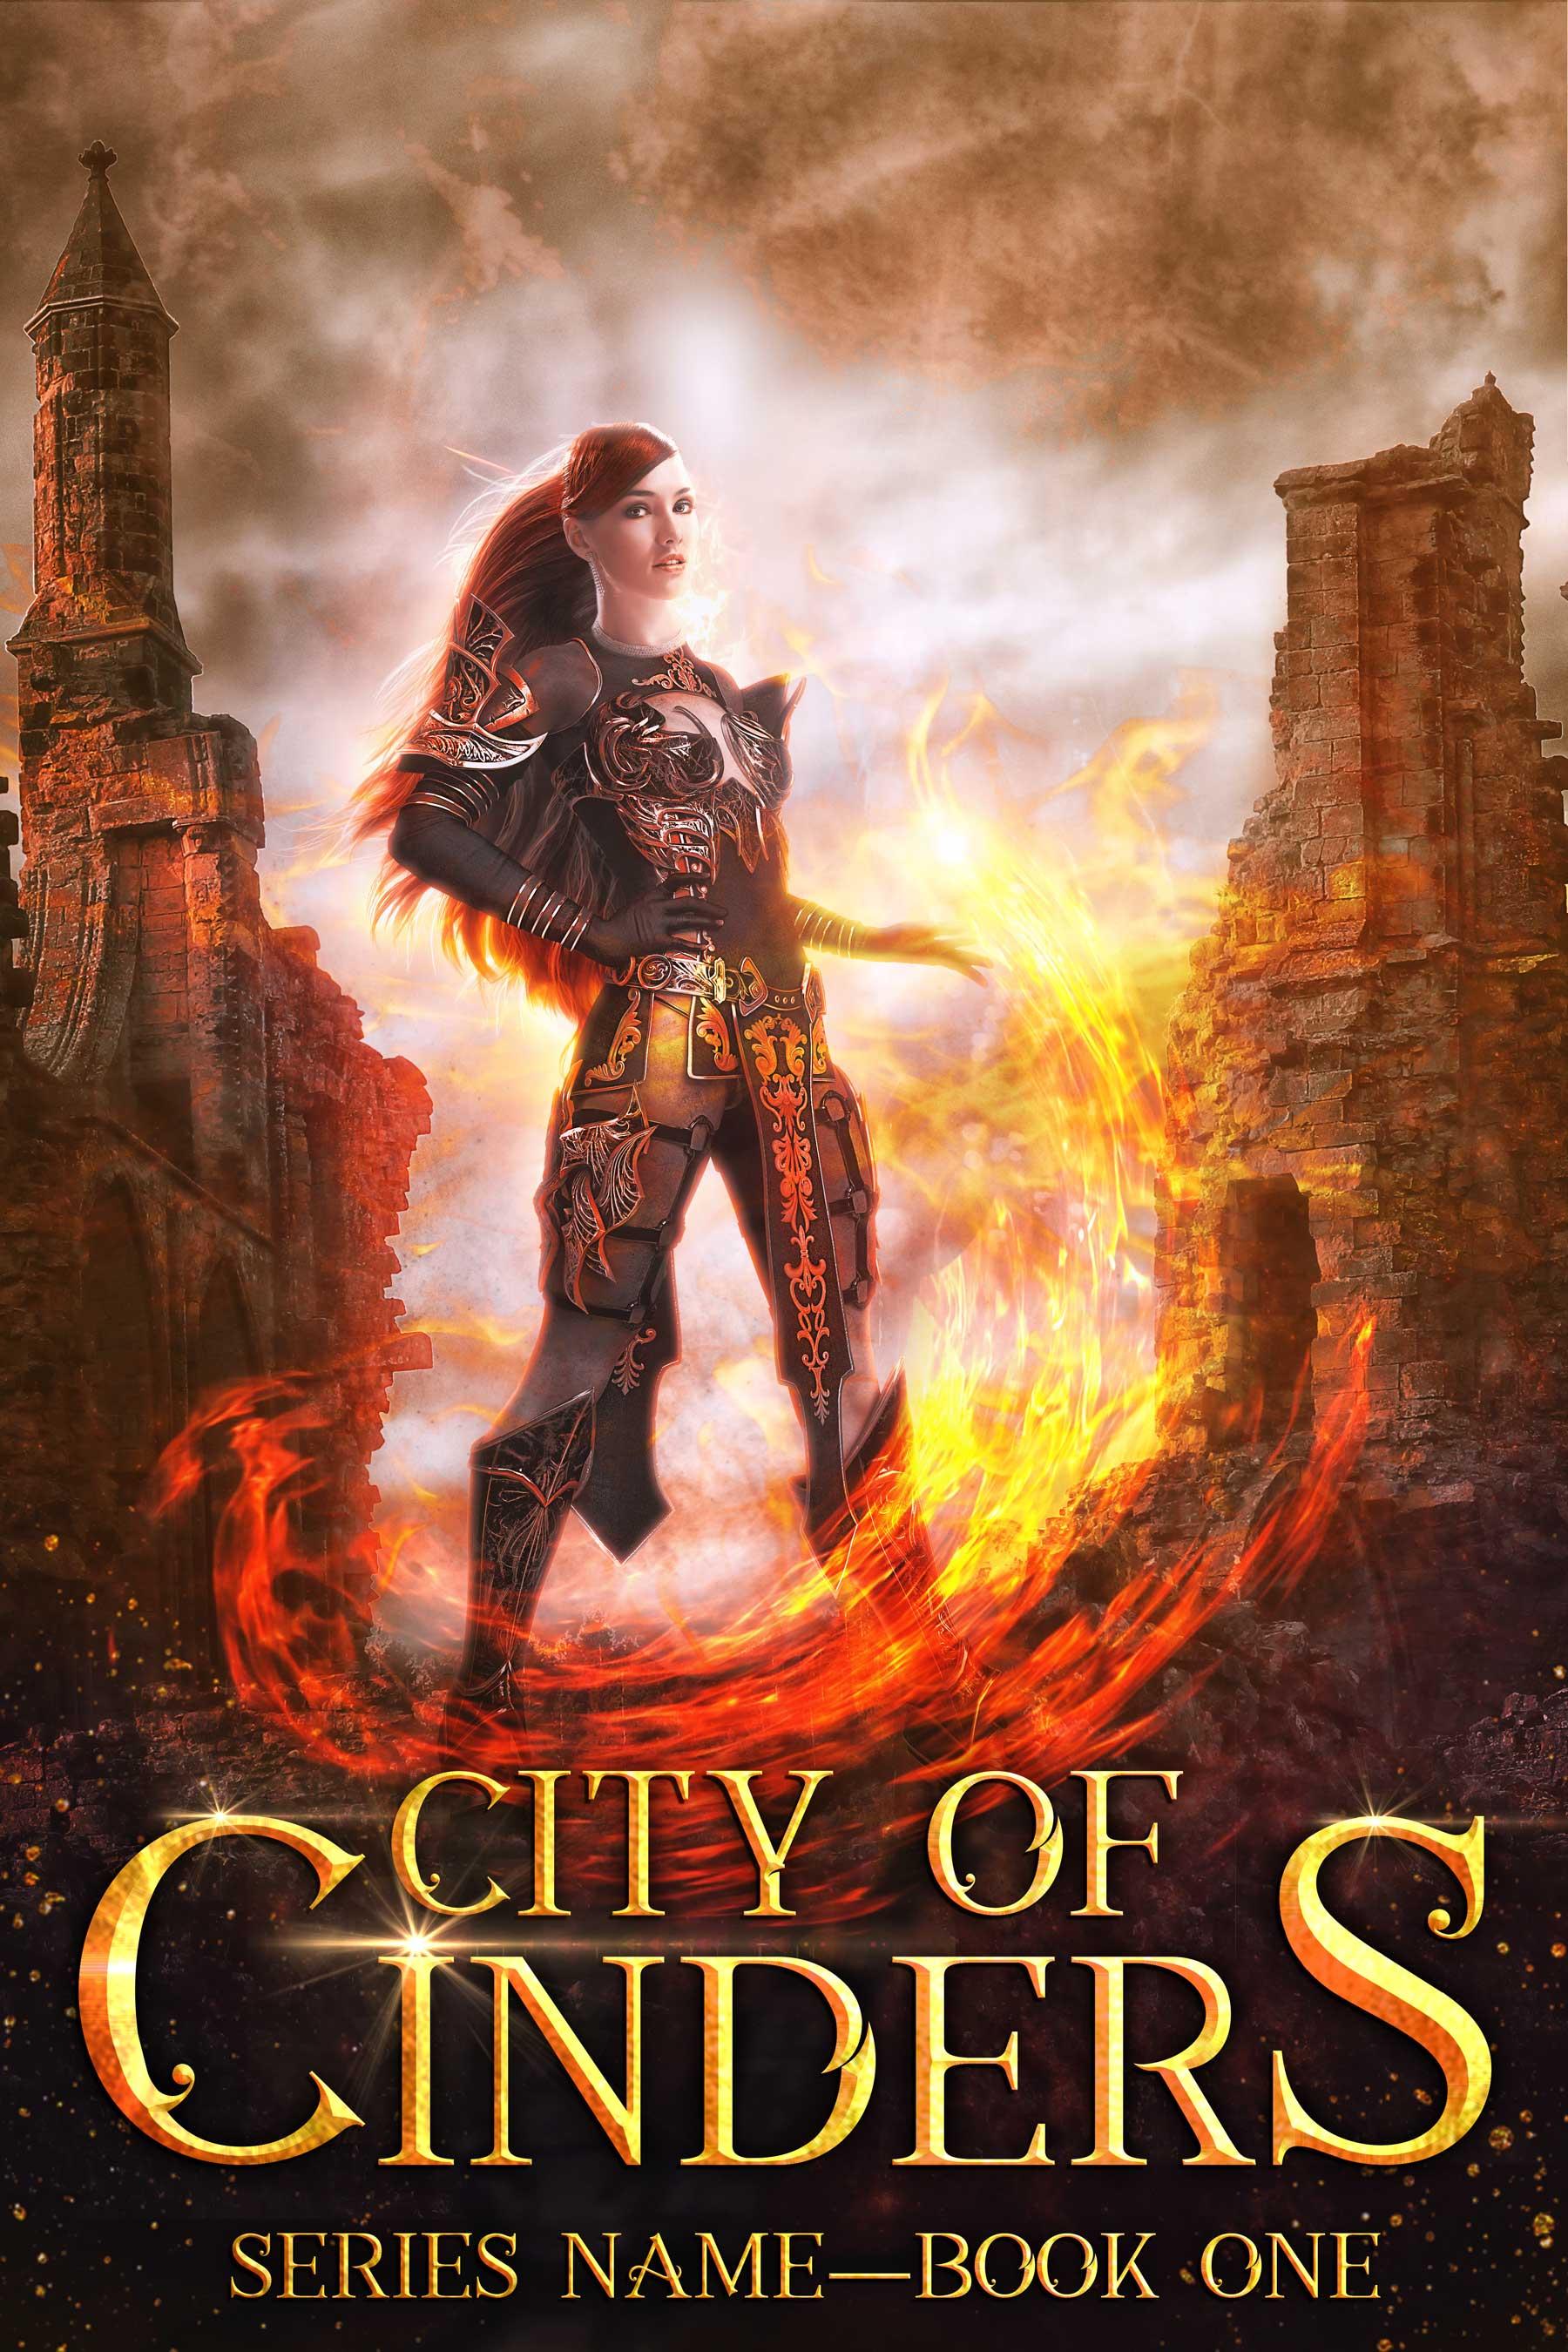 $150 - City of Cinders